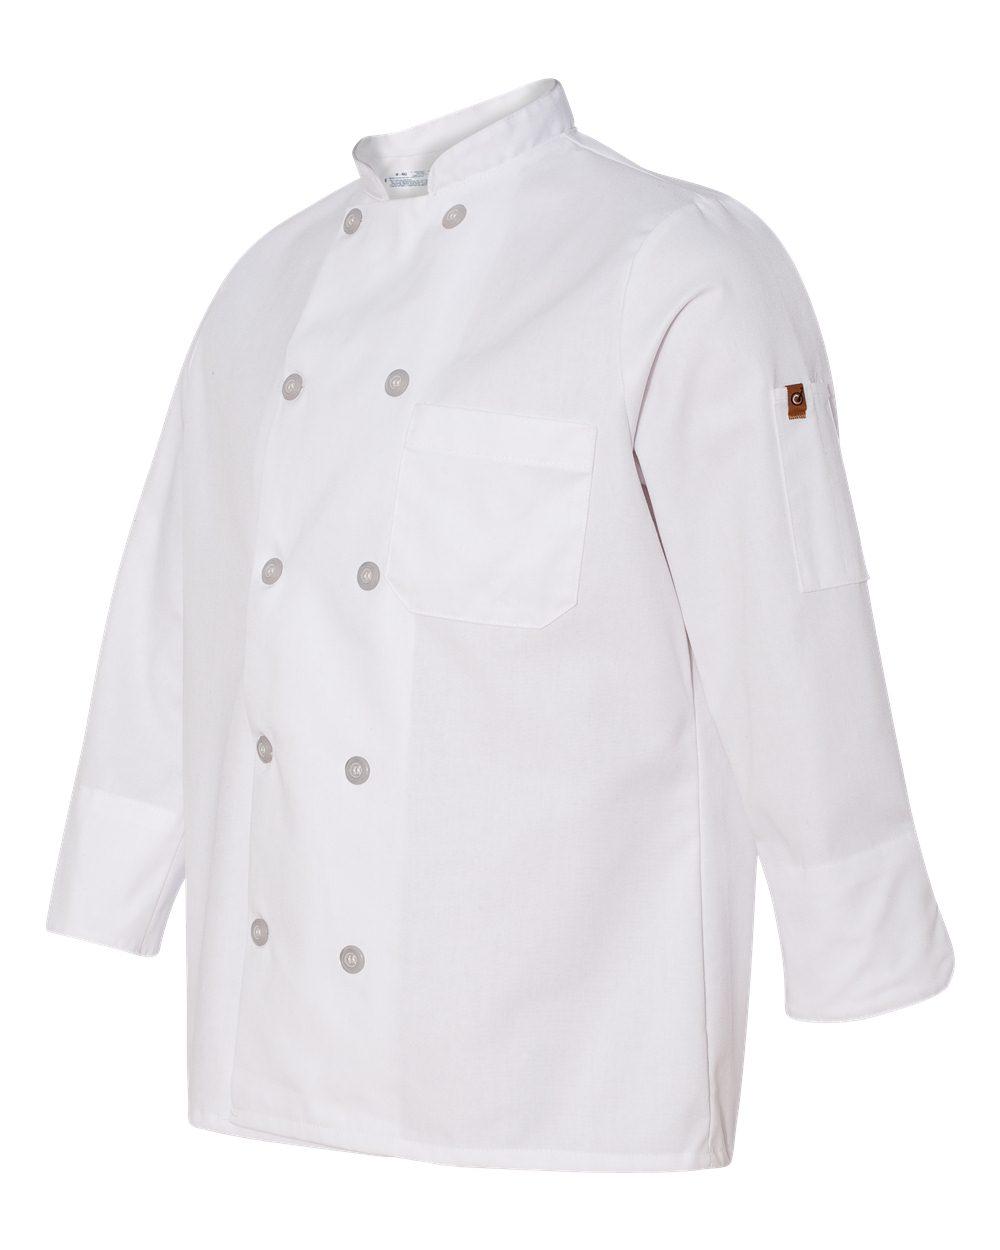 Chef Designs 0401 - Women's Ten Button Chef Coat